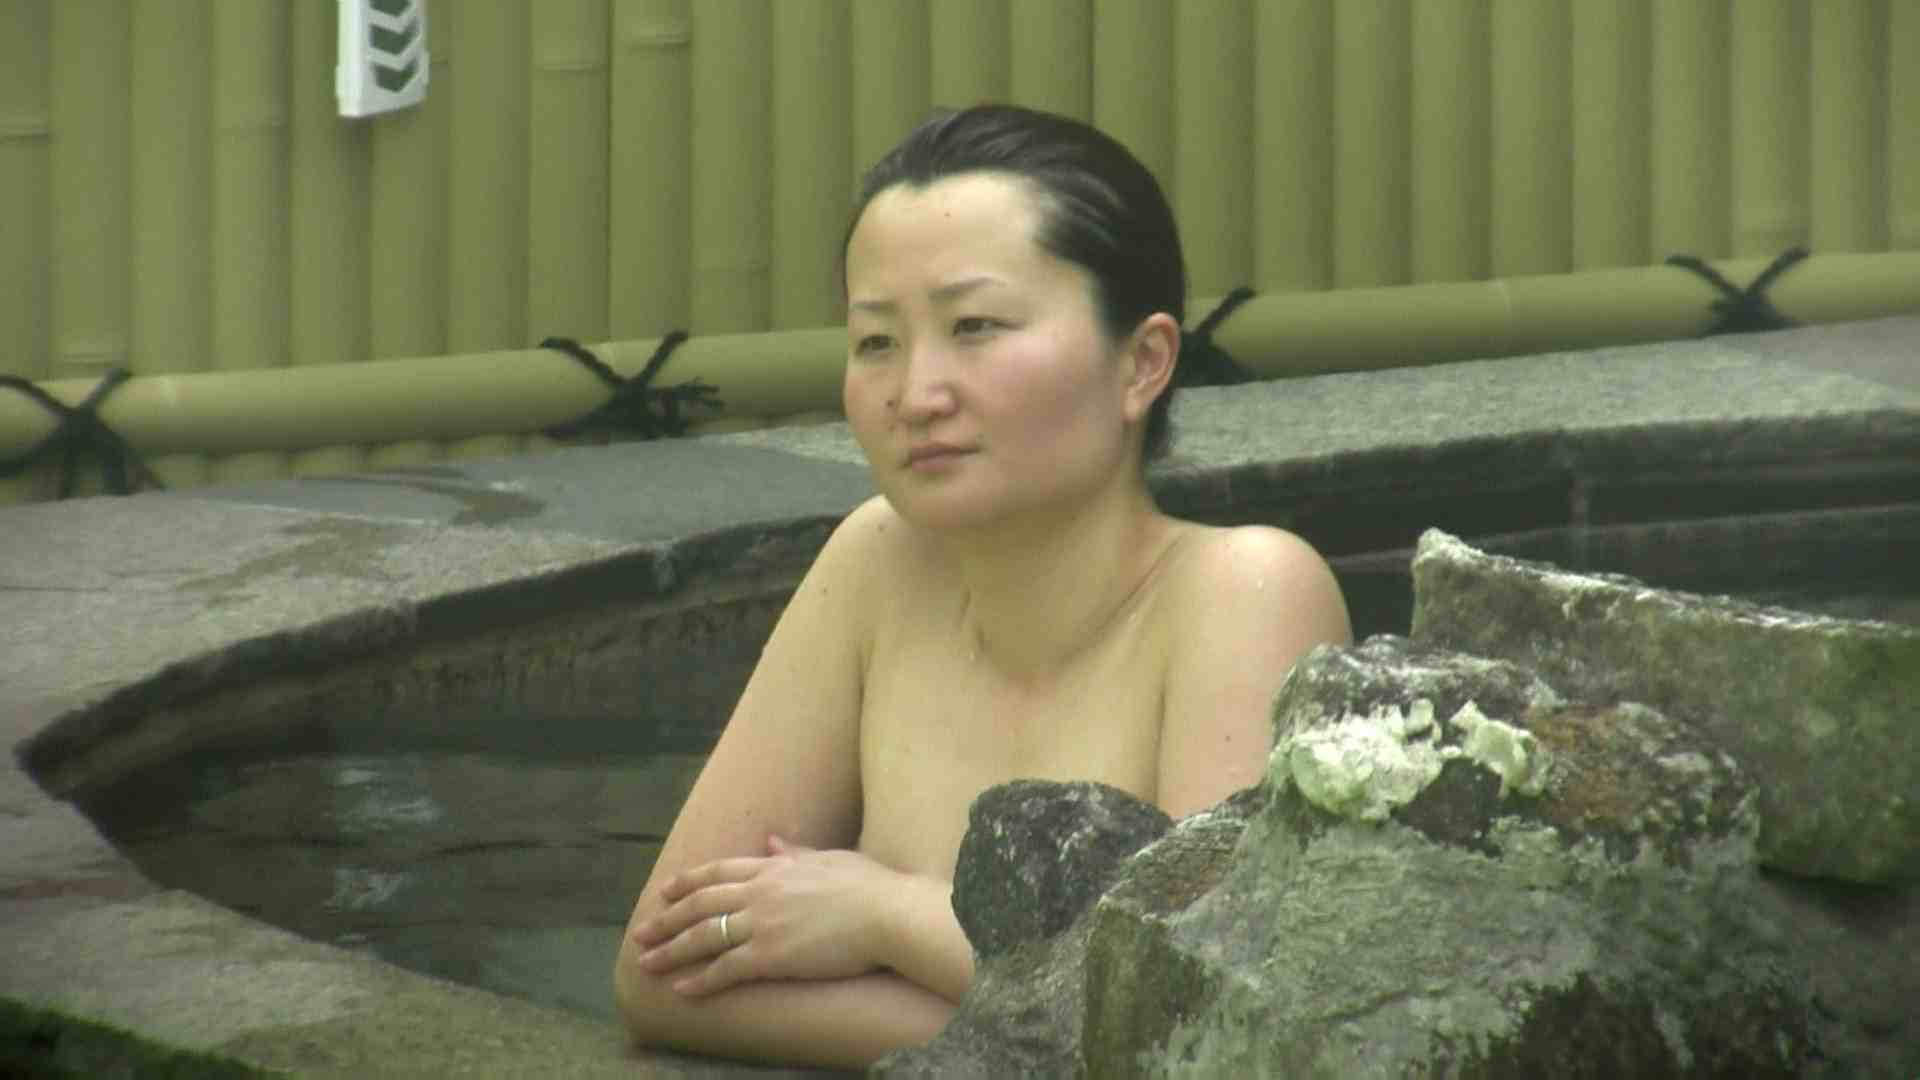 Aquaな露天風呂Vol.632 盗撮シリーズ | 露天風呂編  100PIX 15